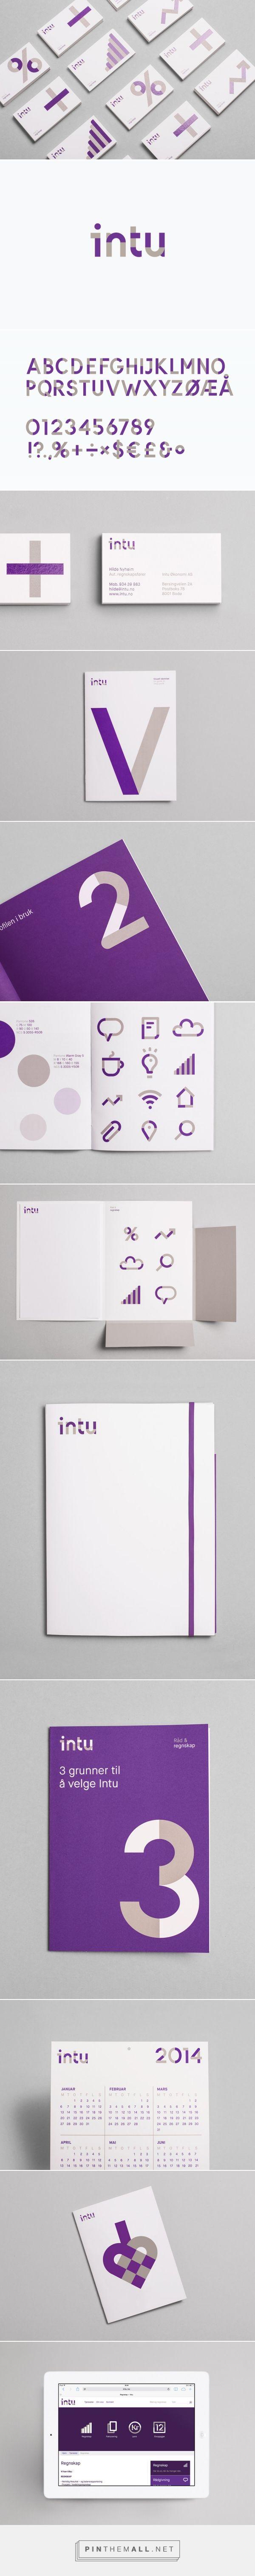 New Logo and Brand Identity for Intu by Heydays - BP&O - www.salfo.it - mauro@salfo.it +39.339.78.54.440